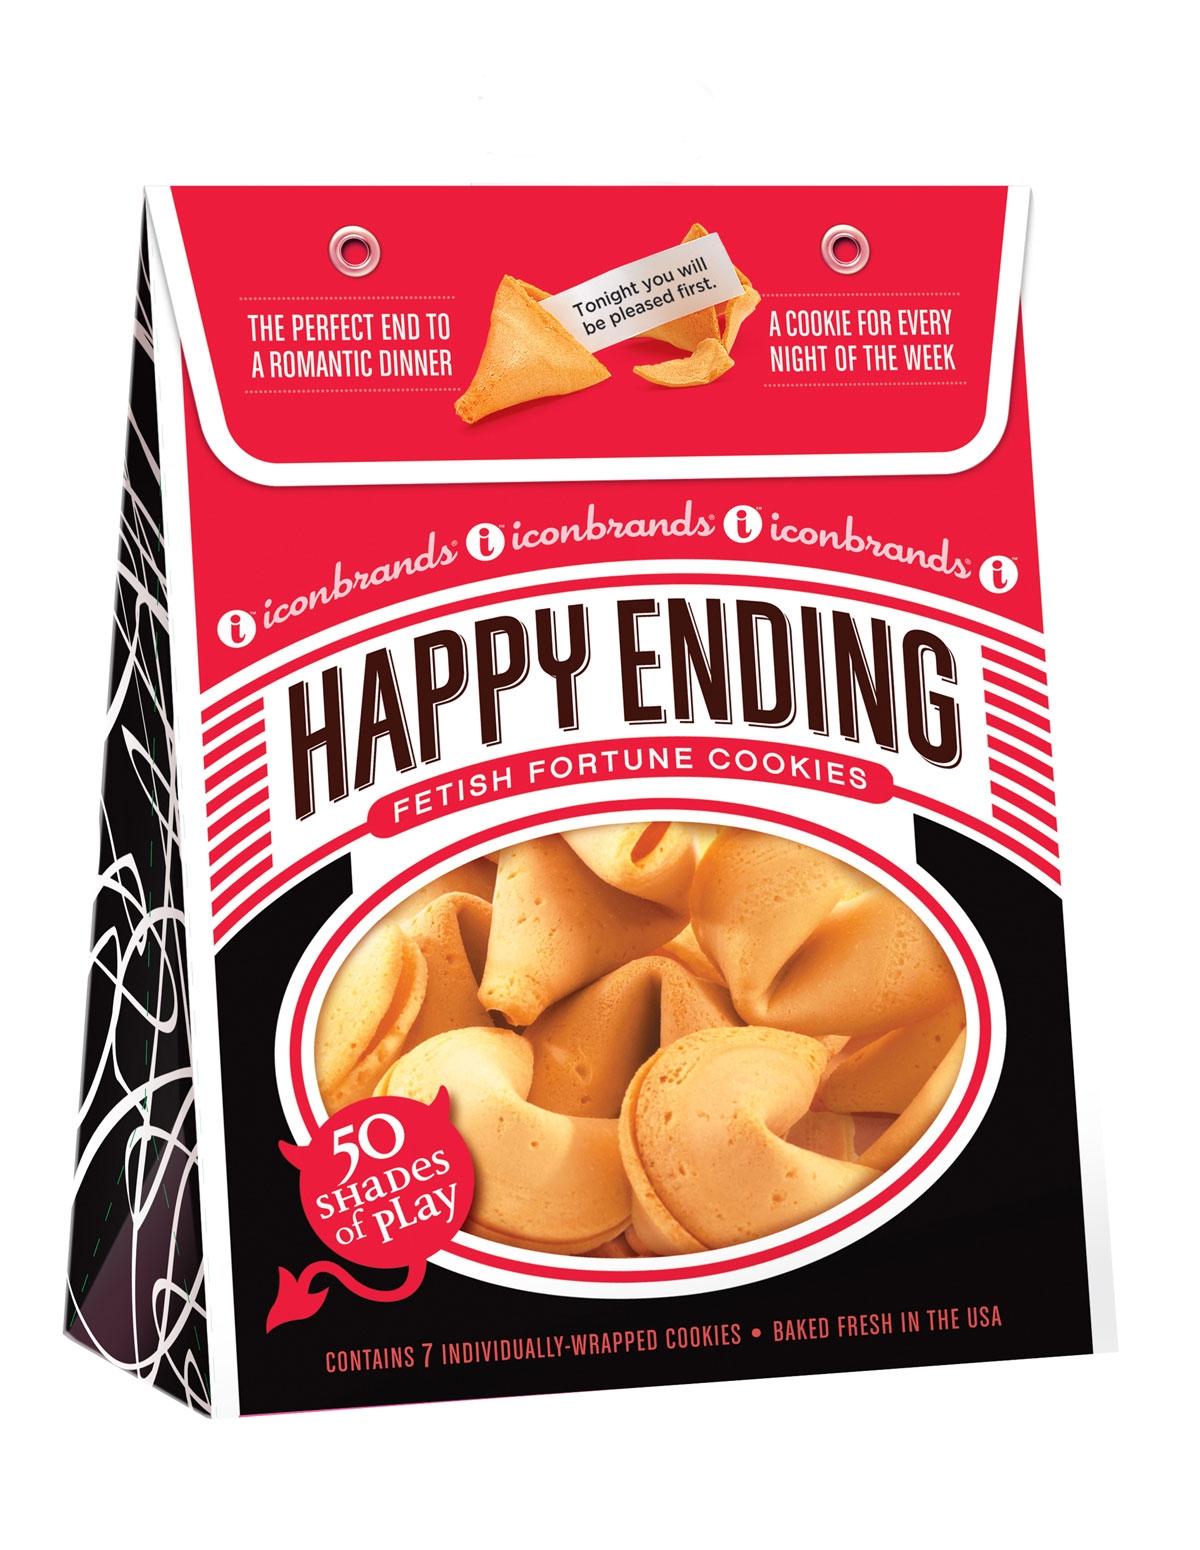 Happy Ending Fortune Cookies - Fetish